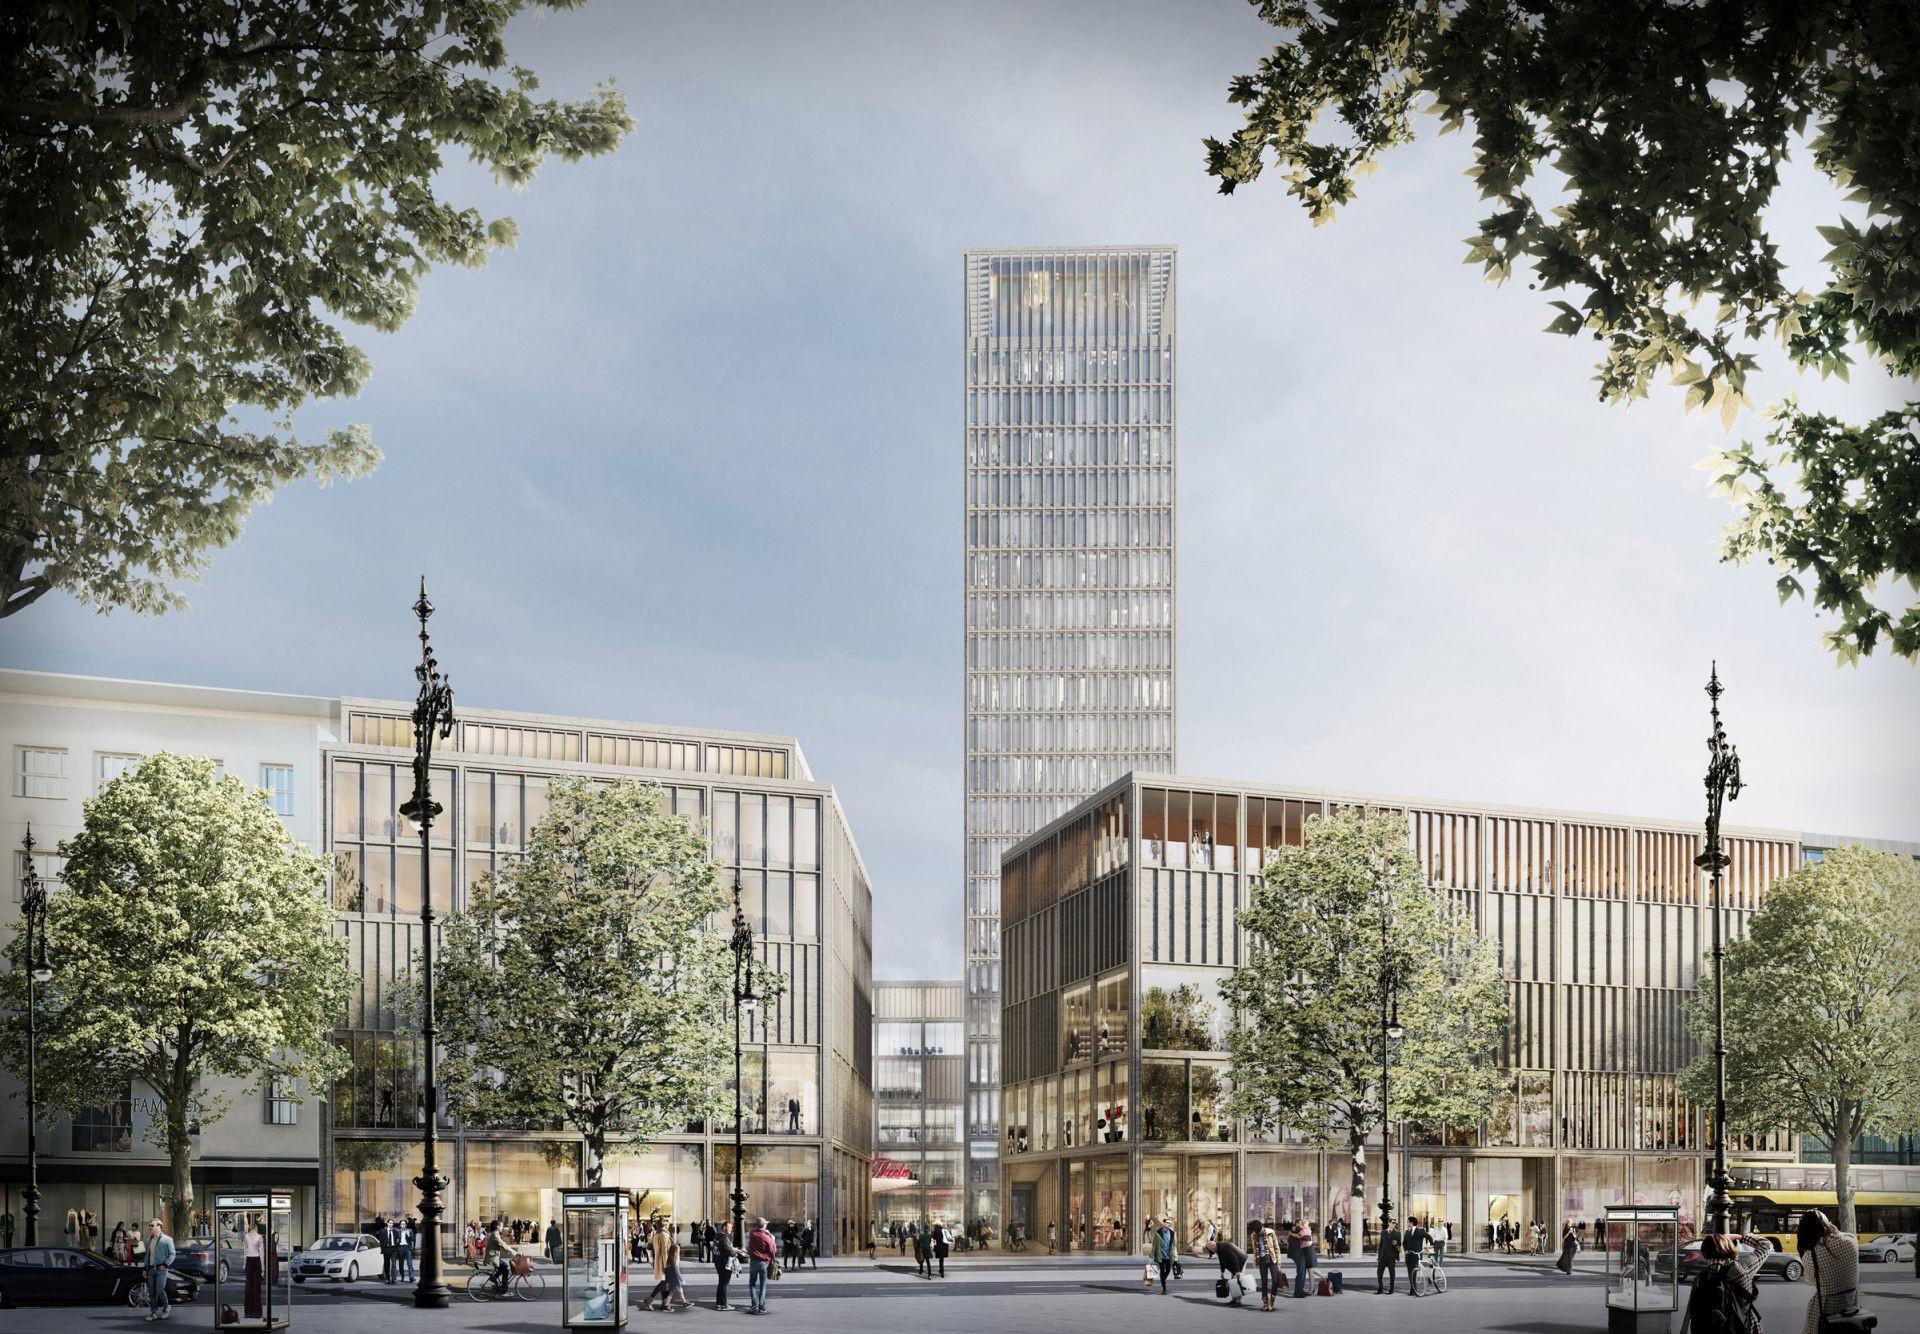 Fürst Ku'damm Karree Hotel Berlin - Market research and operator search